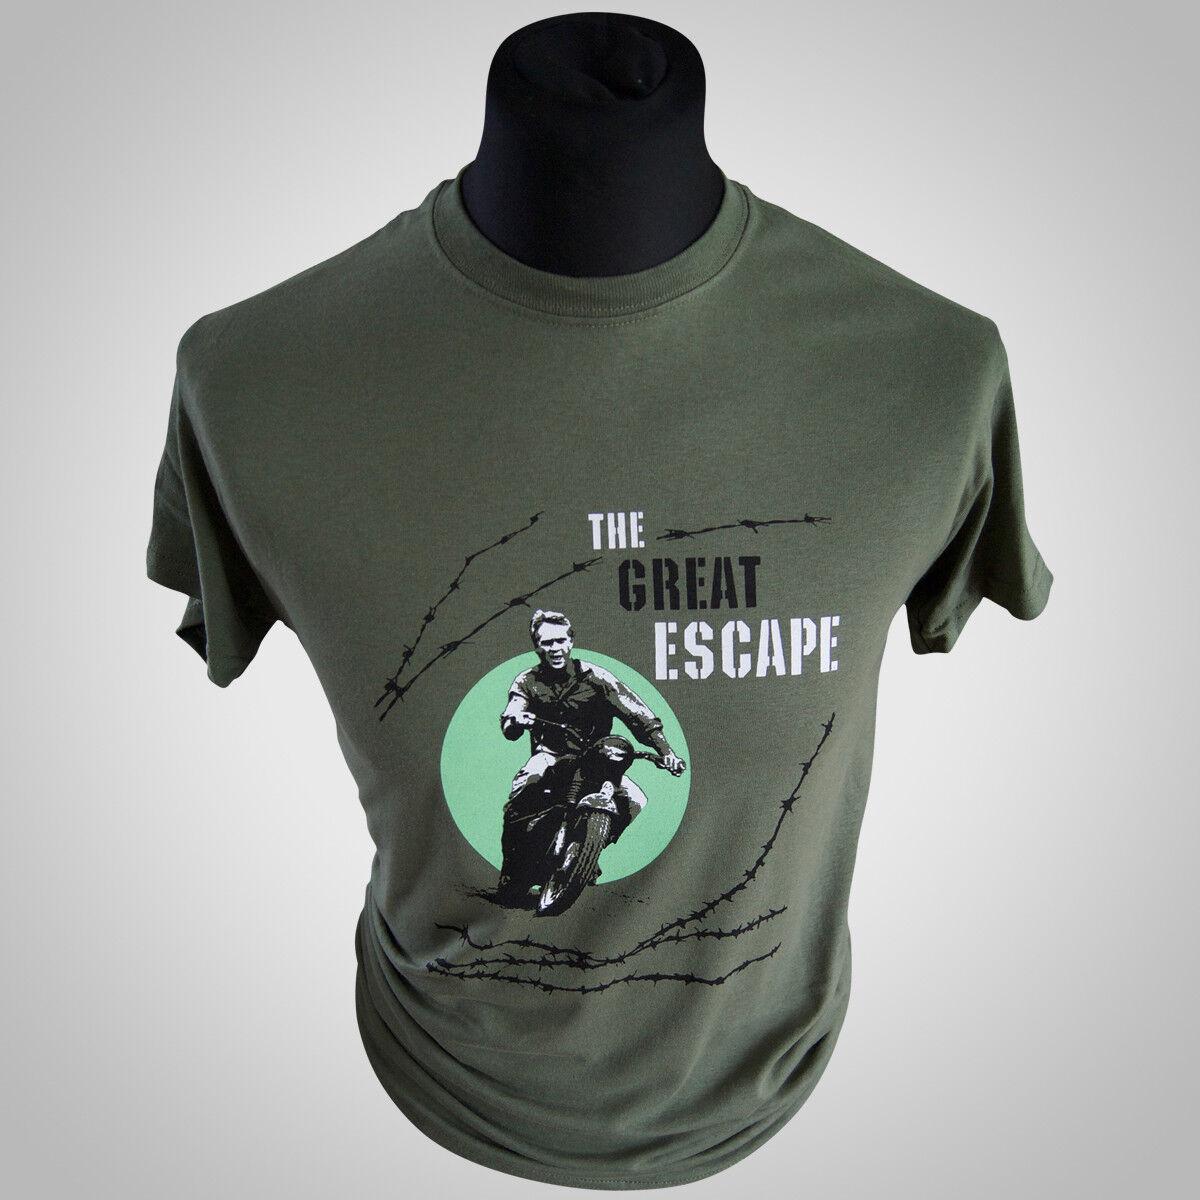 The Great Escape T-Shirt Steve Mcqueen S-XXL T-Shirts